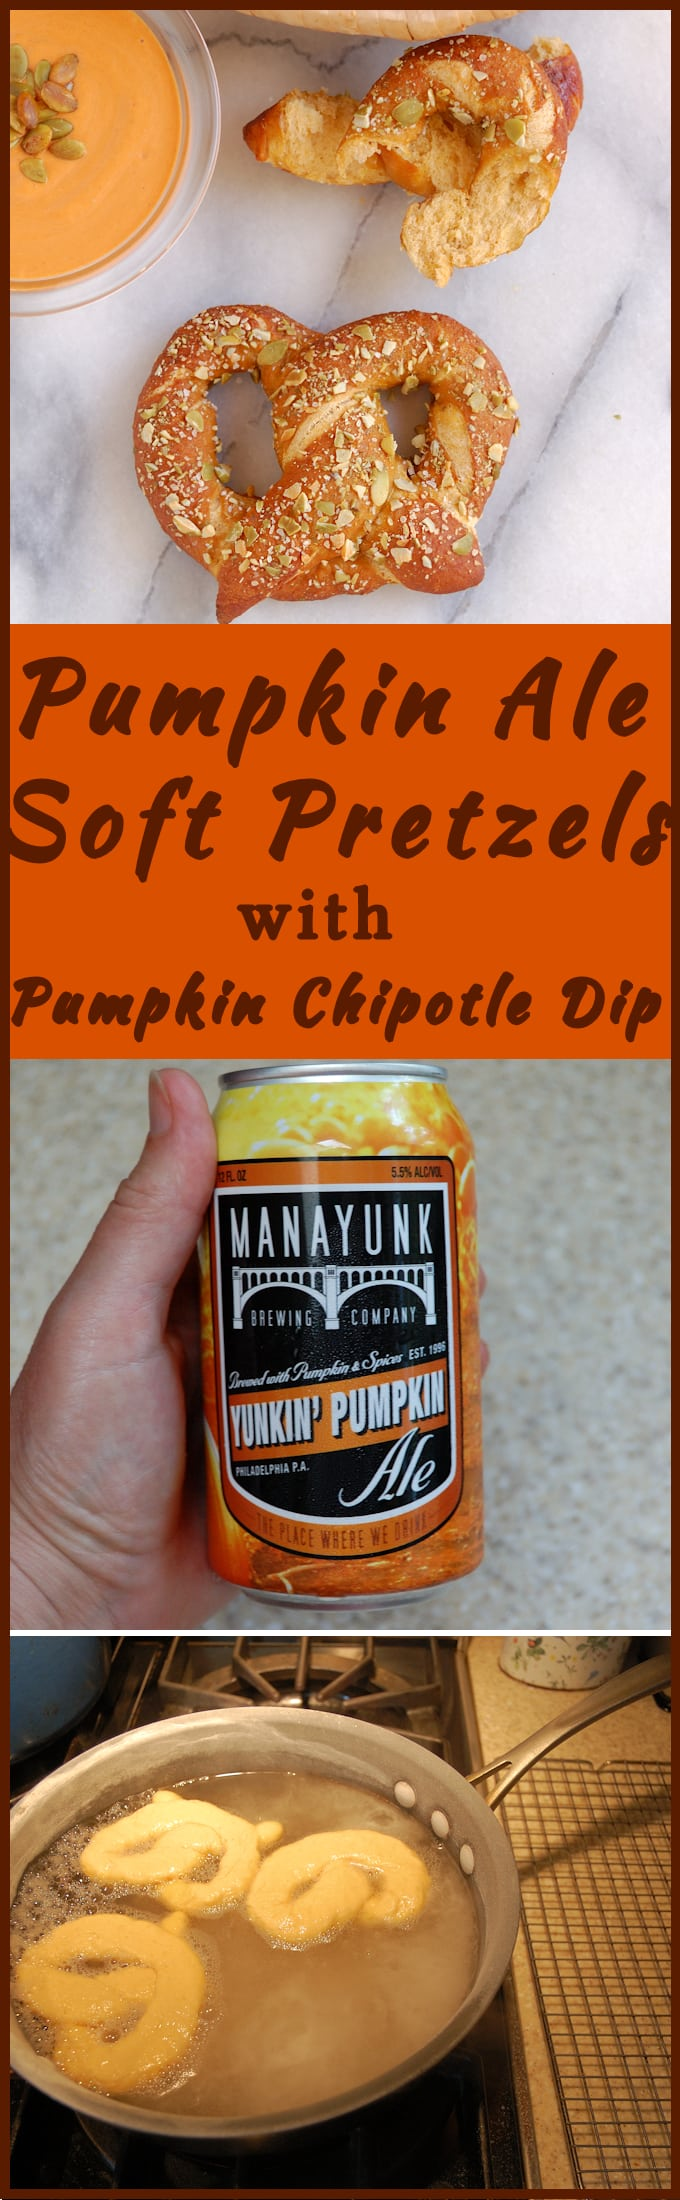 Love Pumpkin Spice Ale? Use it to make Pumpkin Spice Ale Soft Pretzels with Pumpkin Chipotle Dip. Perfect party treat!